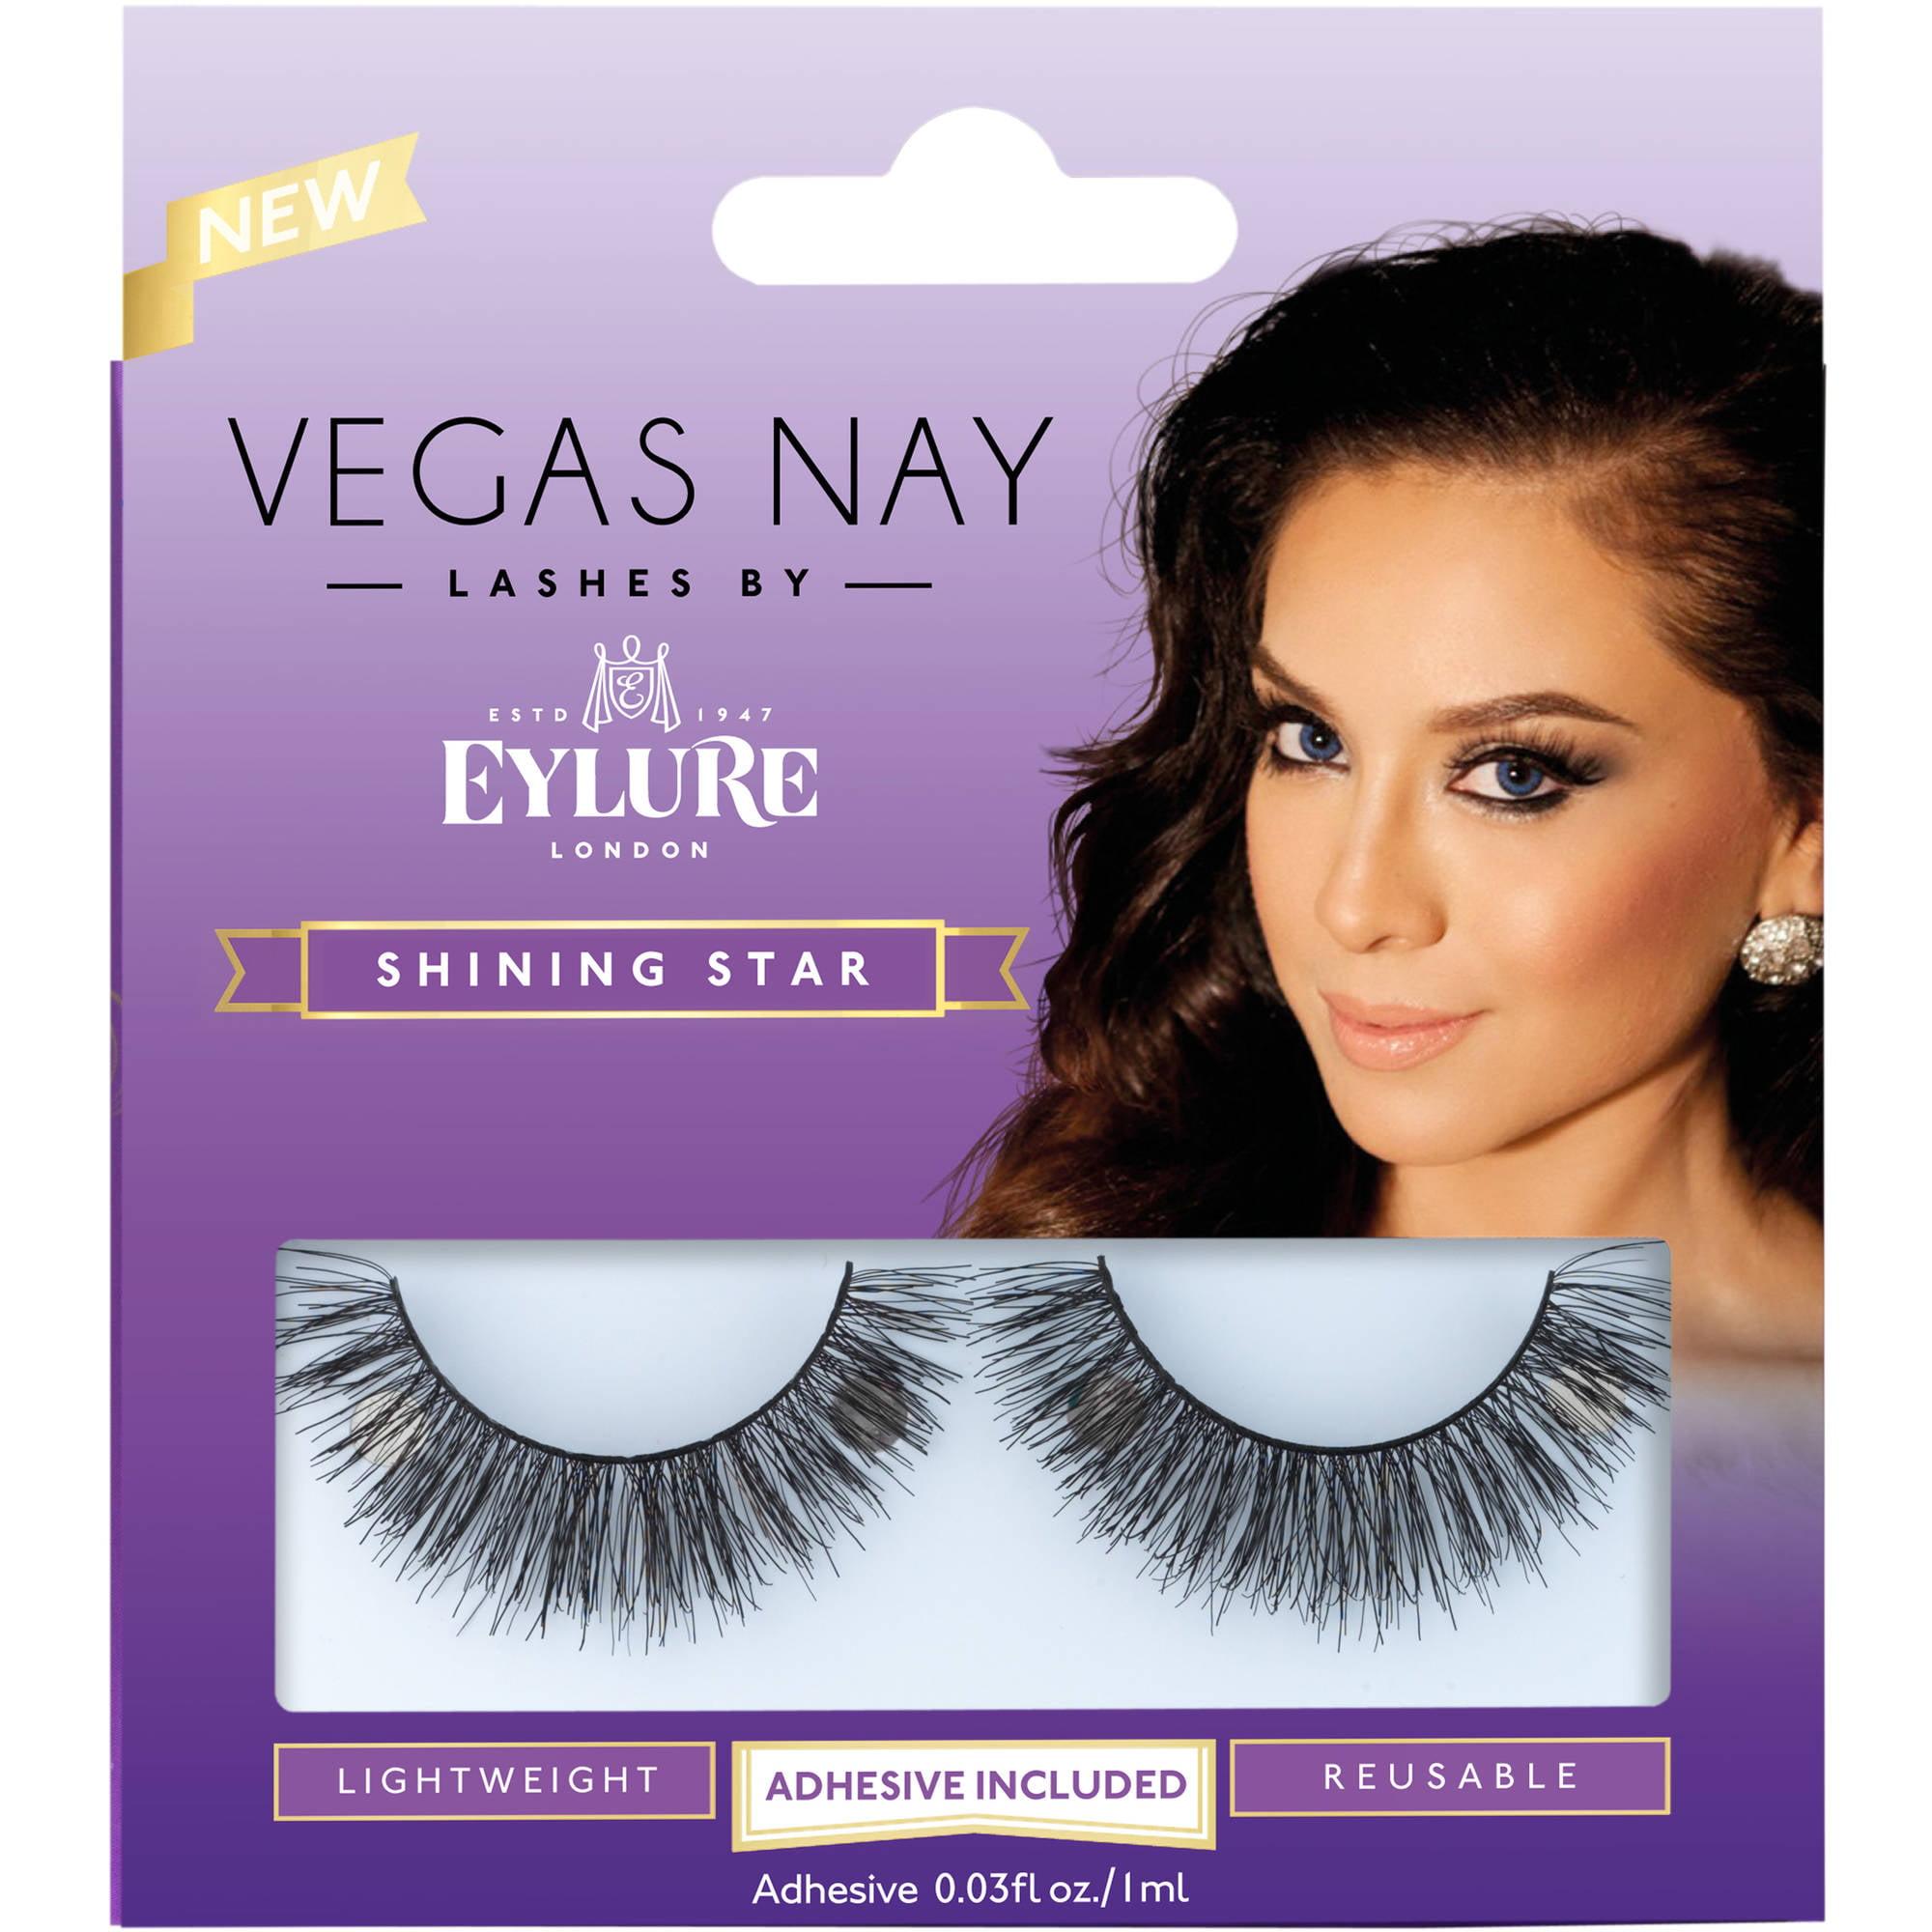 Vegas Nay by Eylure Shining Star Eyelashes Kit, 2 pc